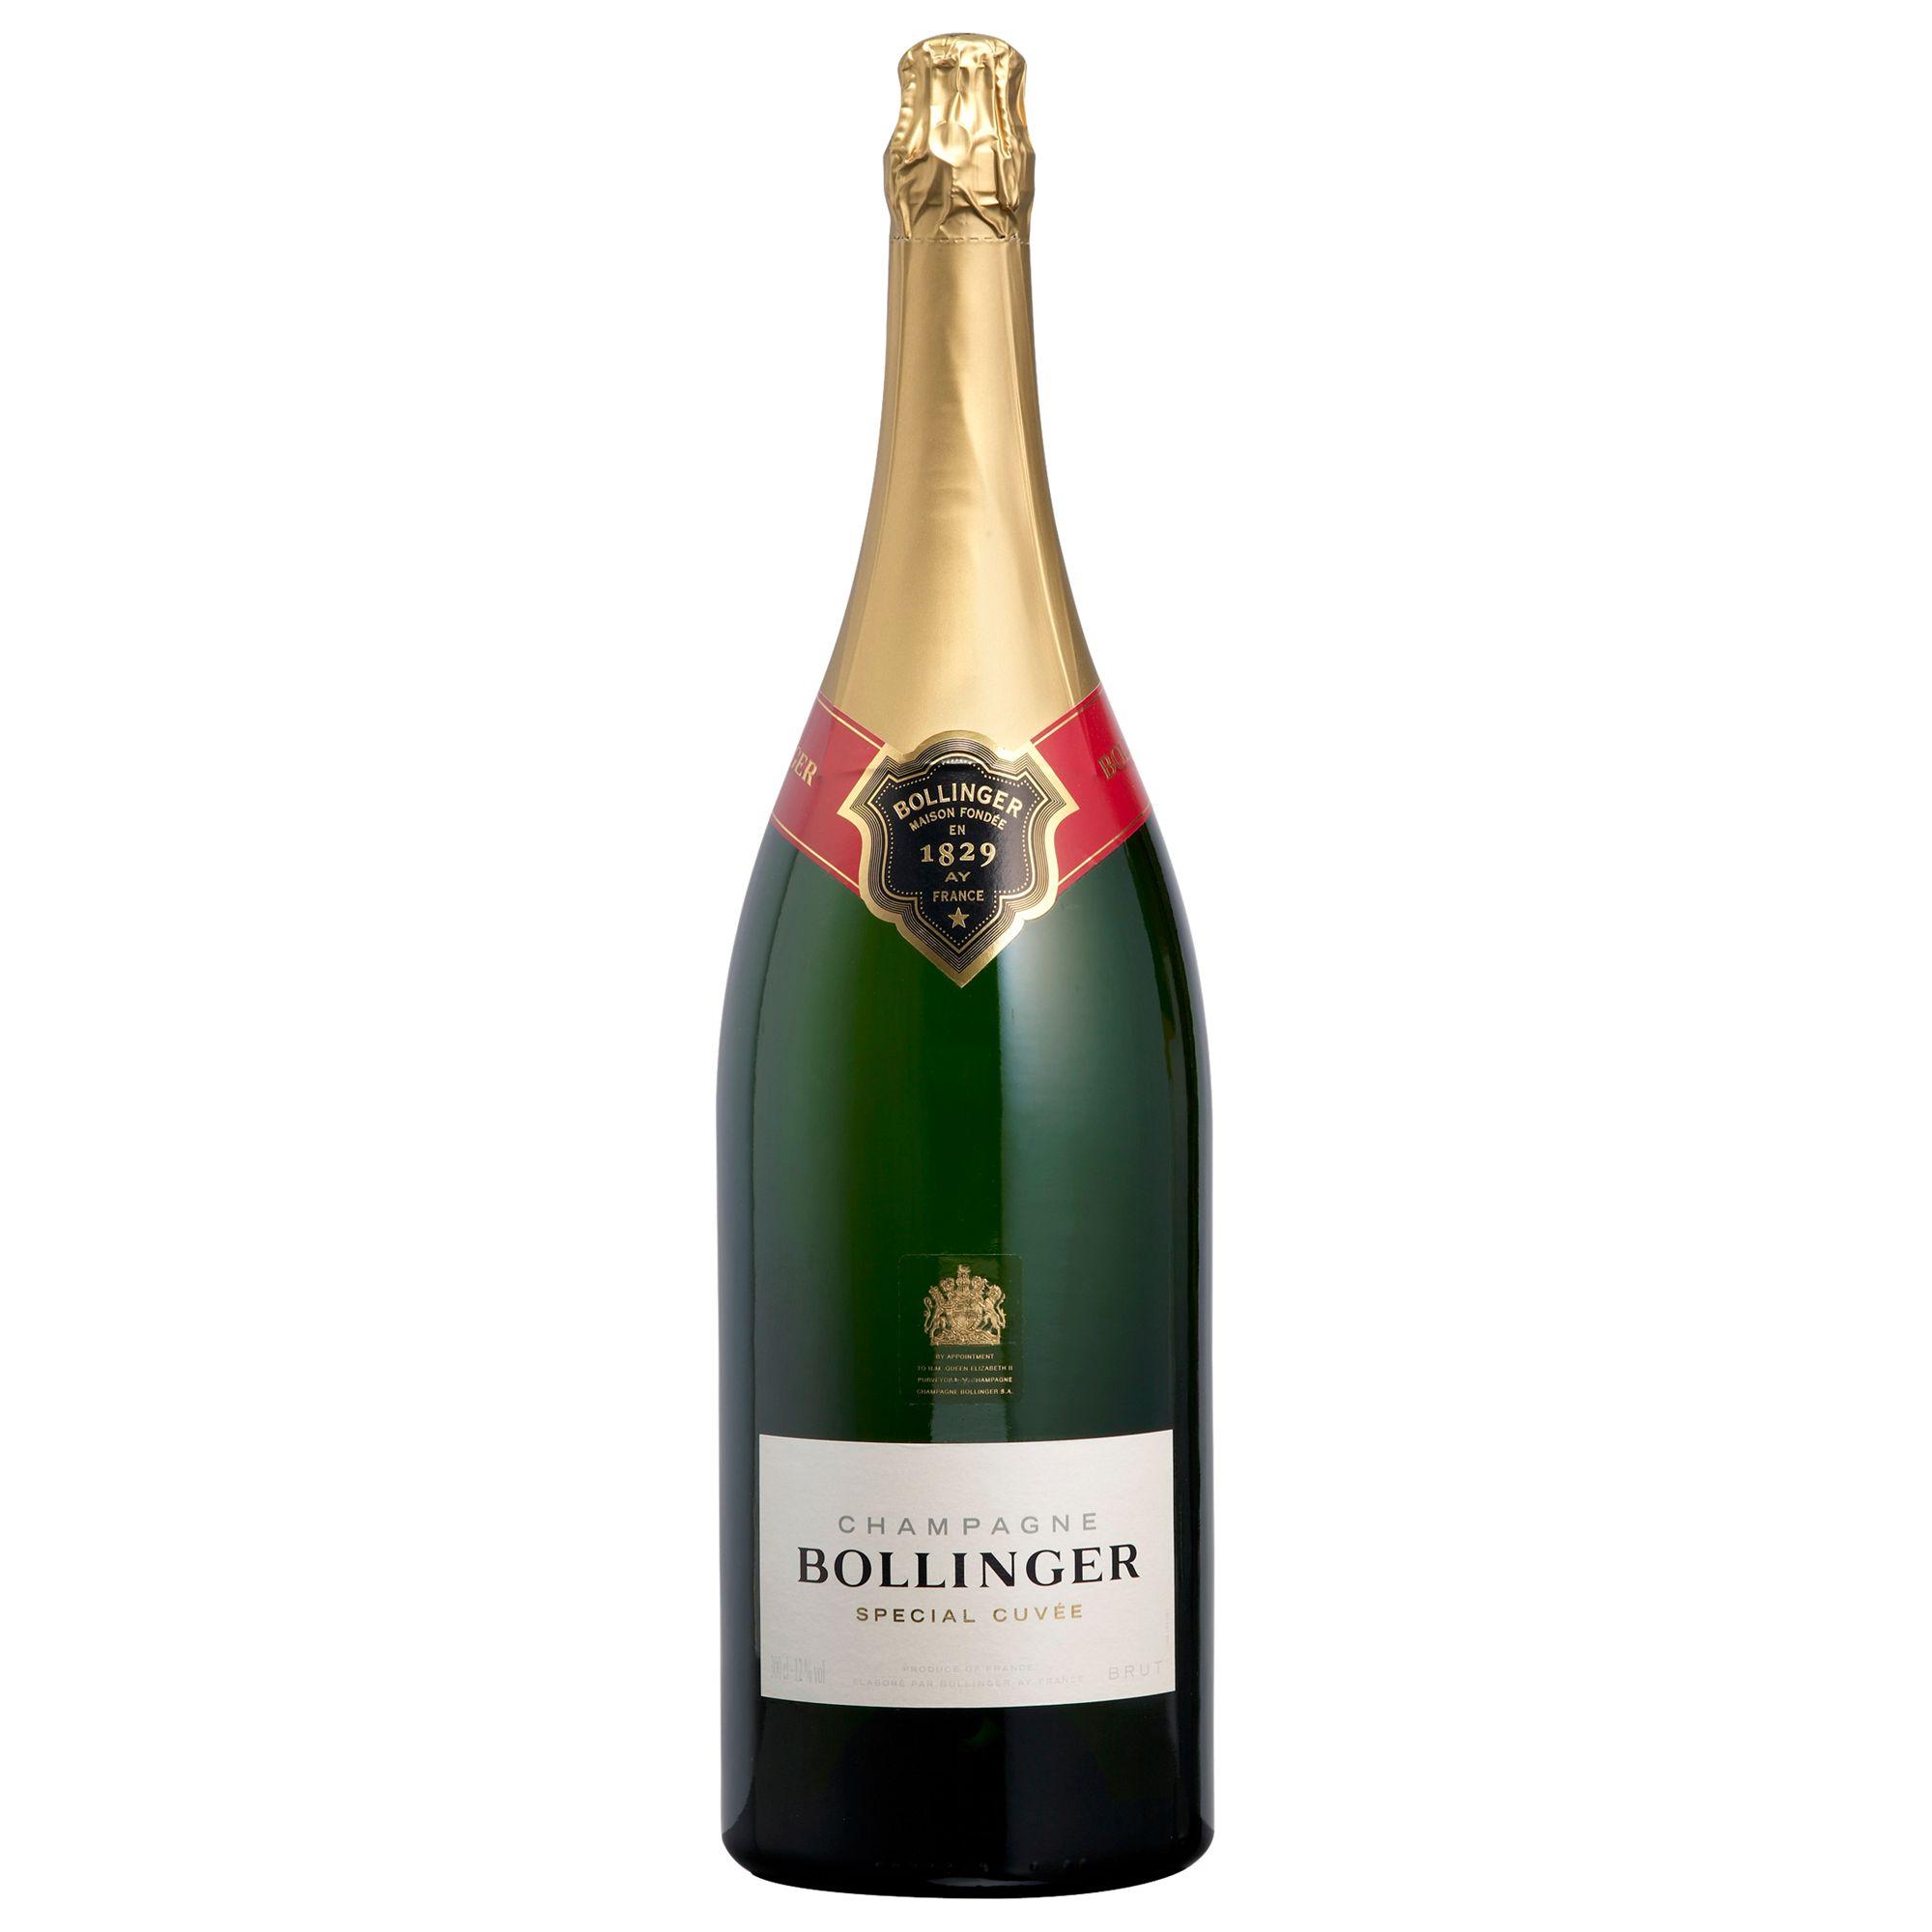 Bollinger Bollinger Special Cuvee Champagne Jeroboam, 300cl